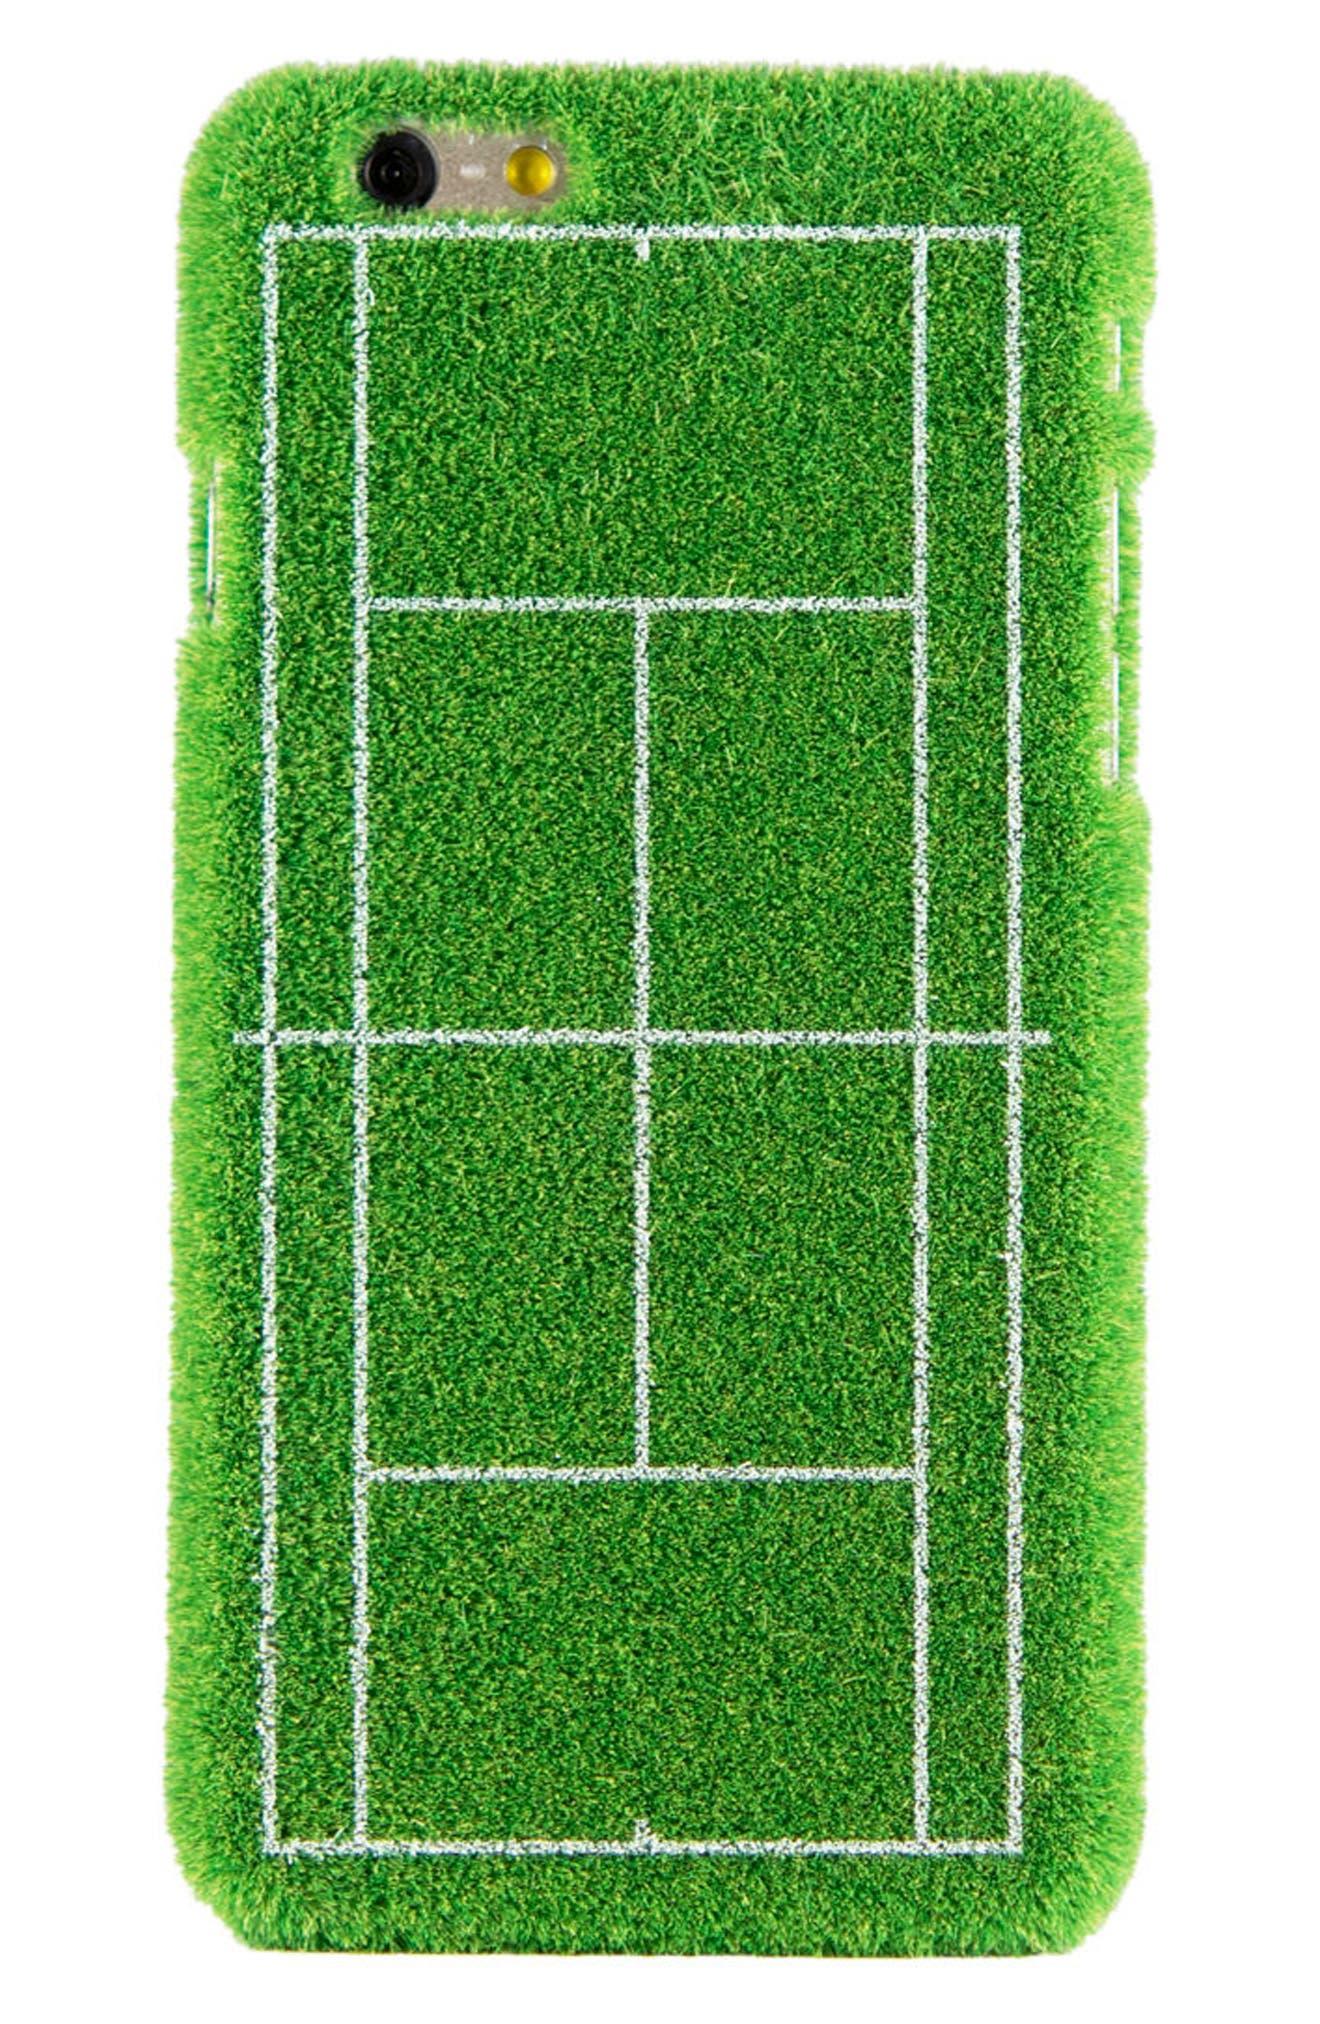 Grand Slam Portable Park iPhone 6/6s & 6/6s Plus Case,                             Alternate thumbnail 2, color,                             GREEN